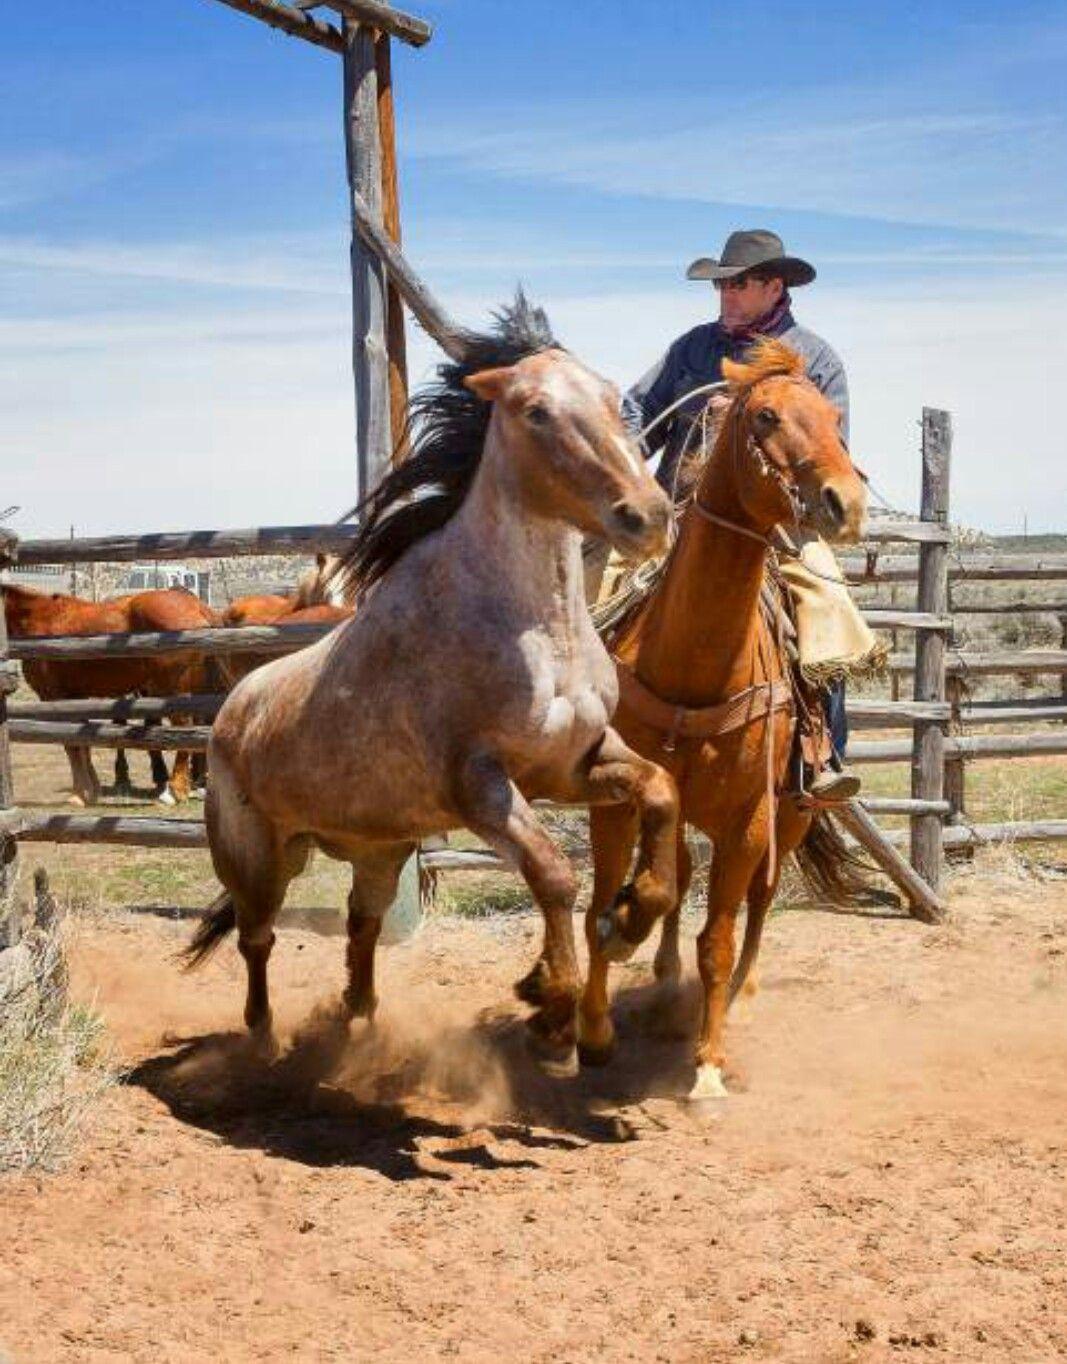 Pin de jheycob 🇵🇦 Lopez en Doma cowboy  50fe64d69e8